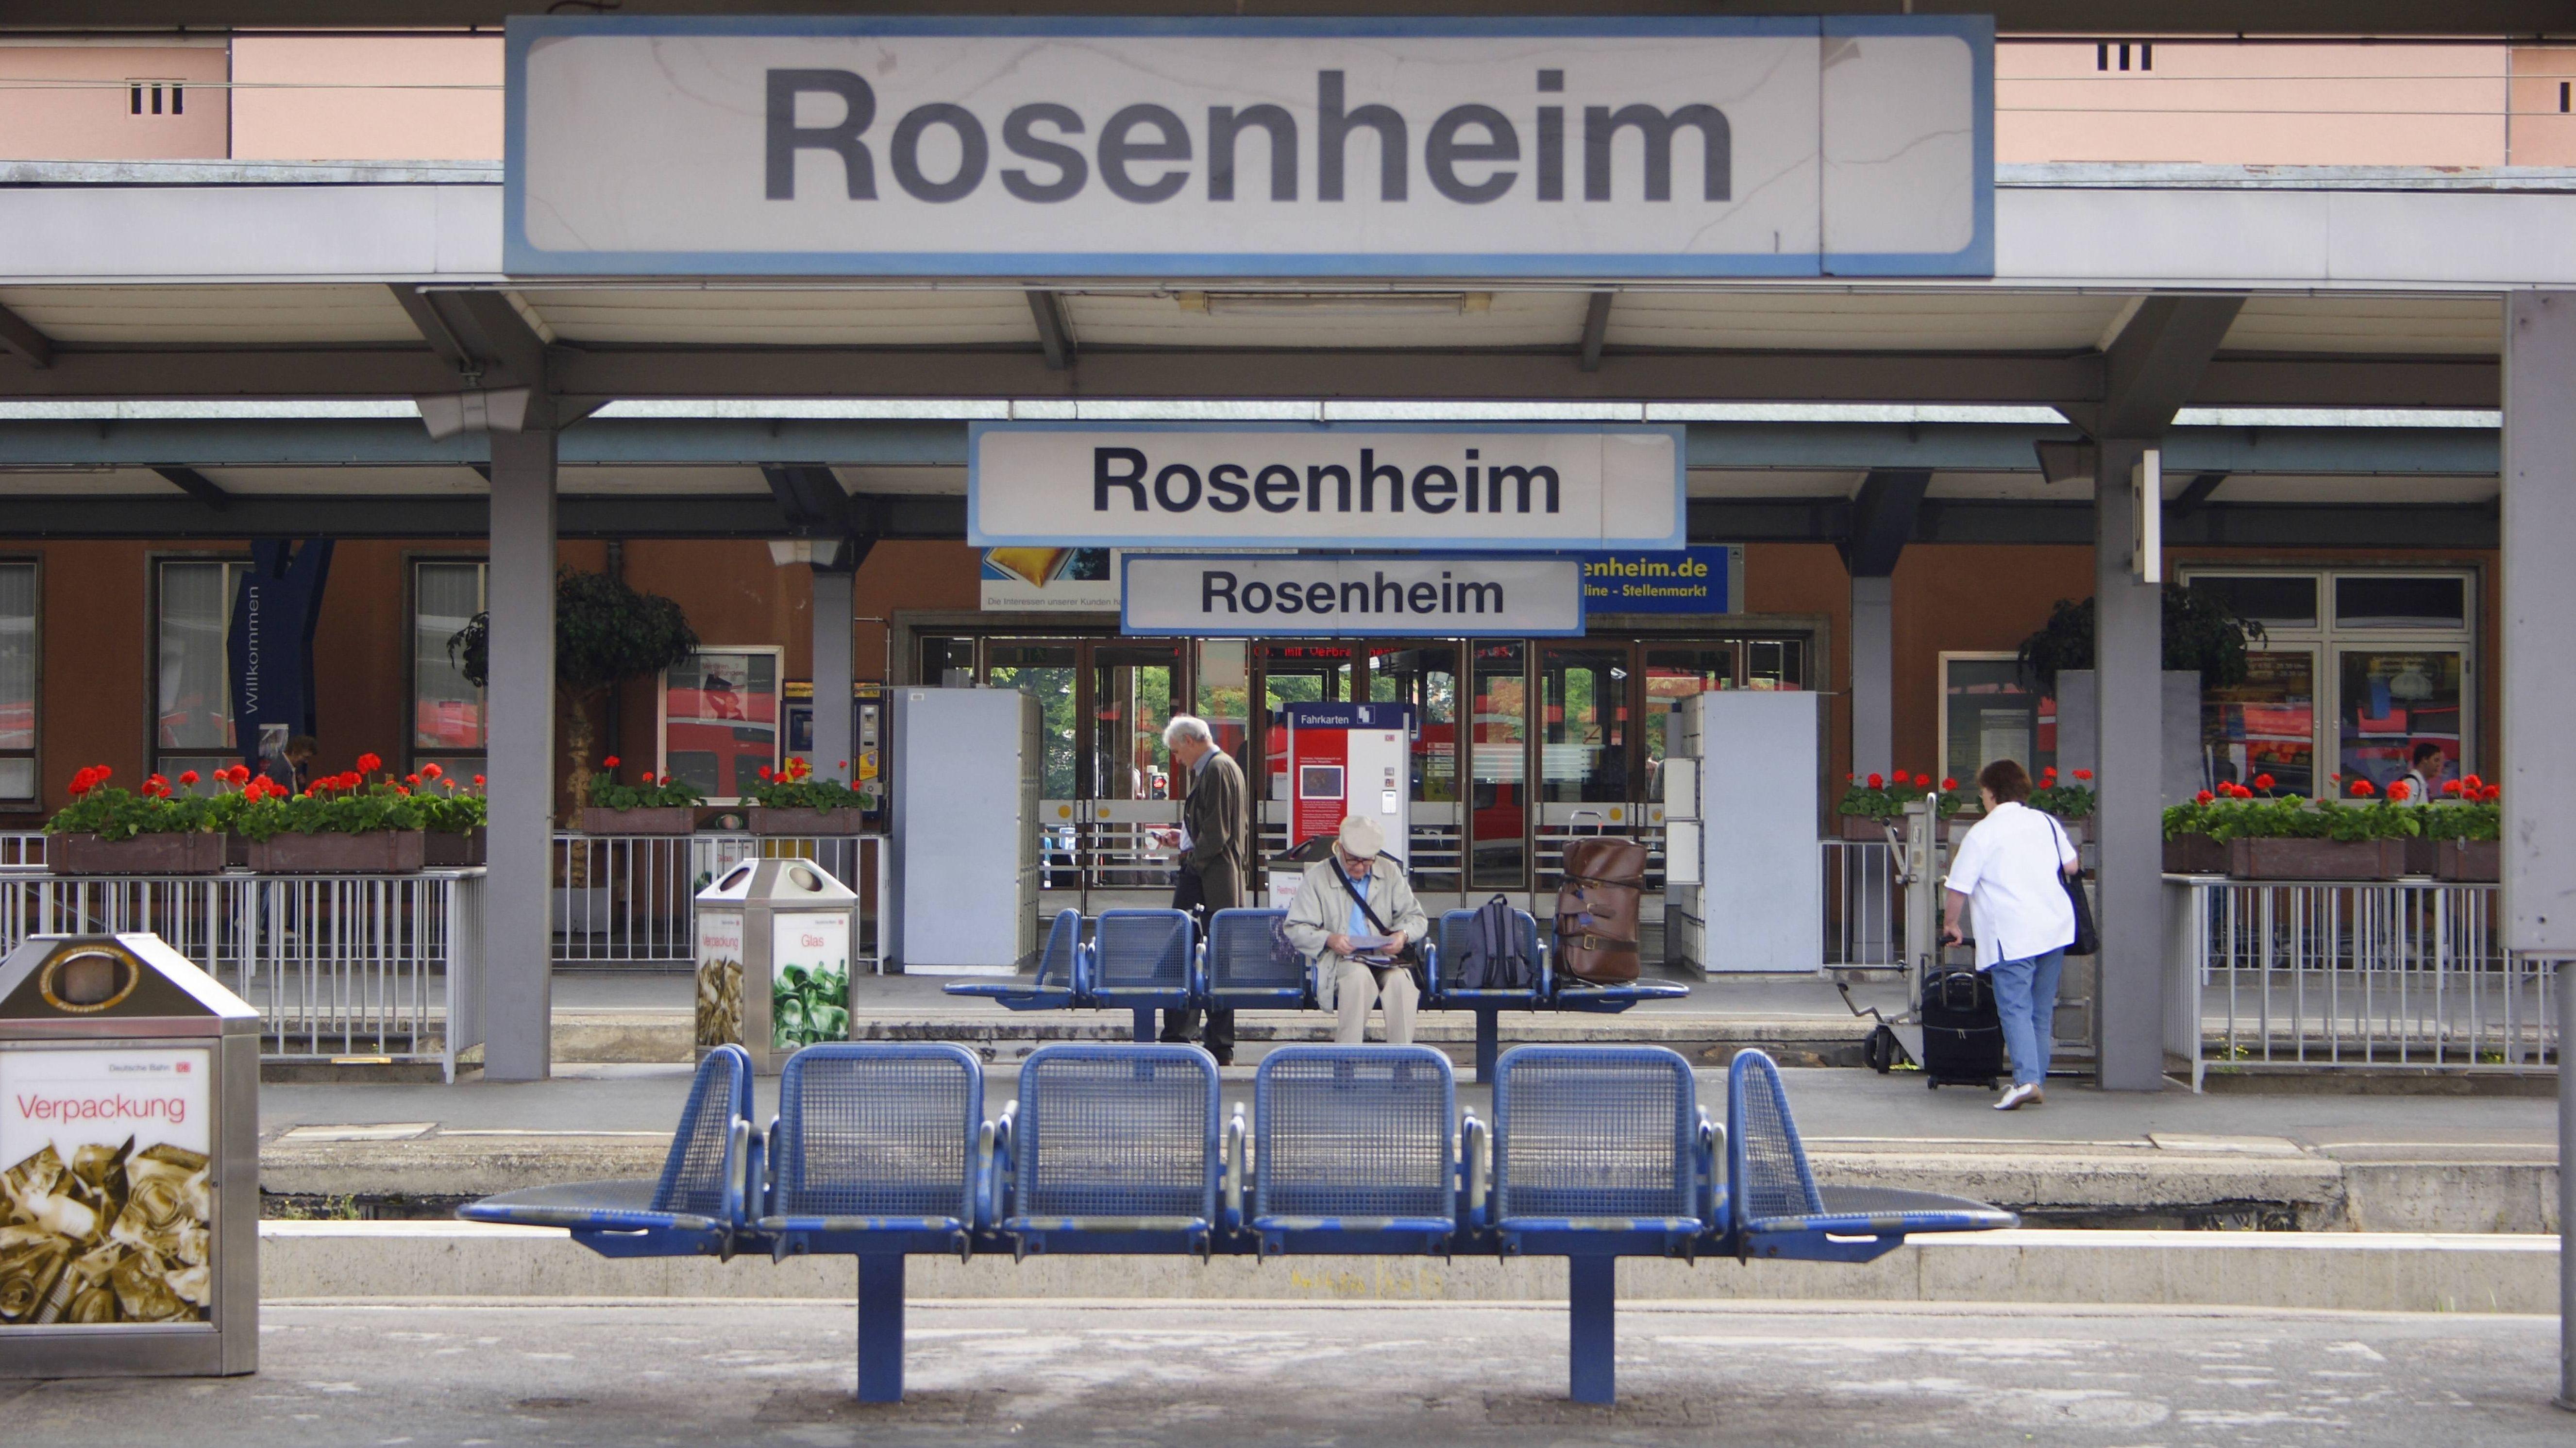 Bahnhof Rosenheim